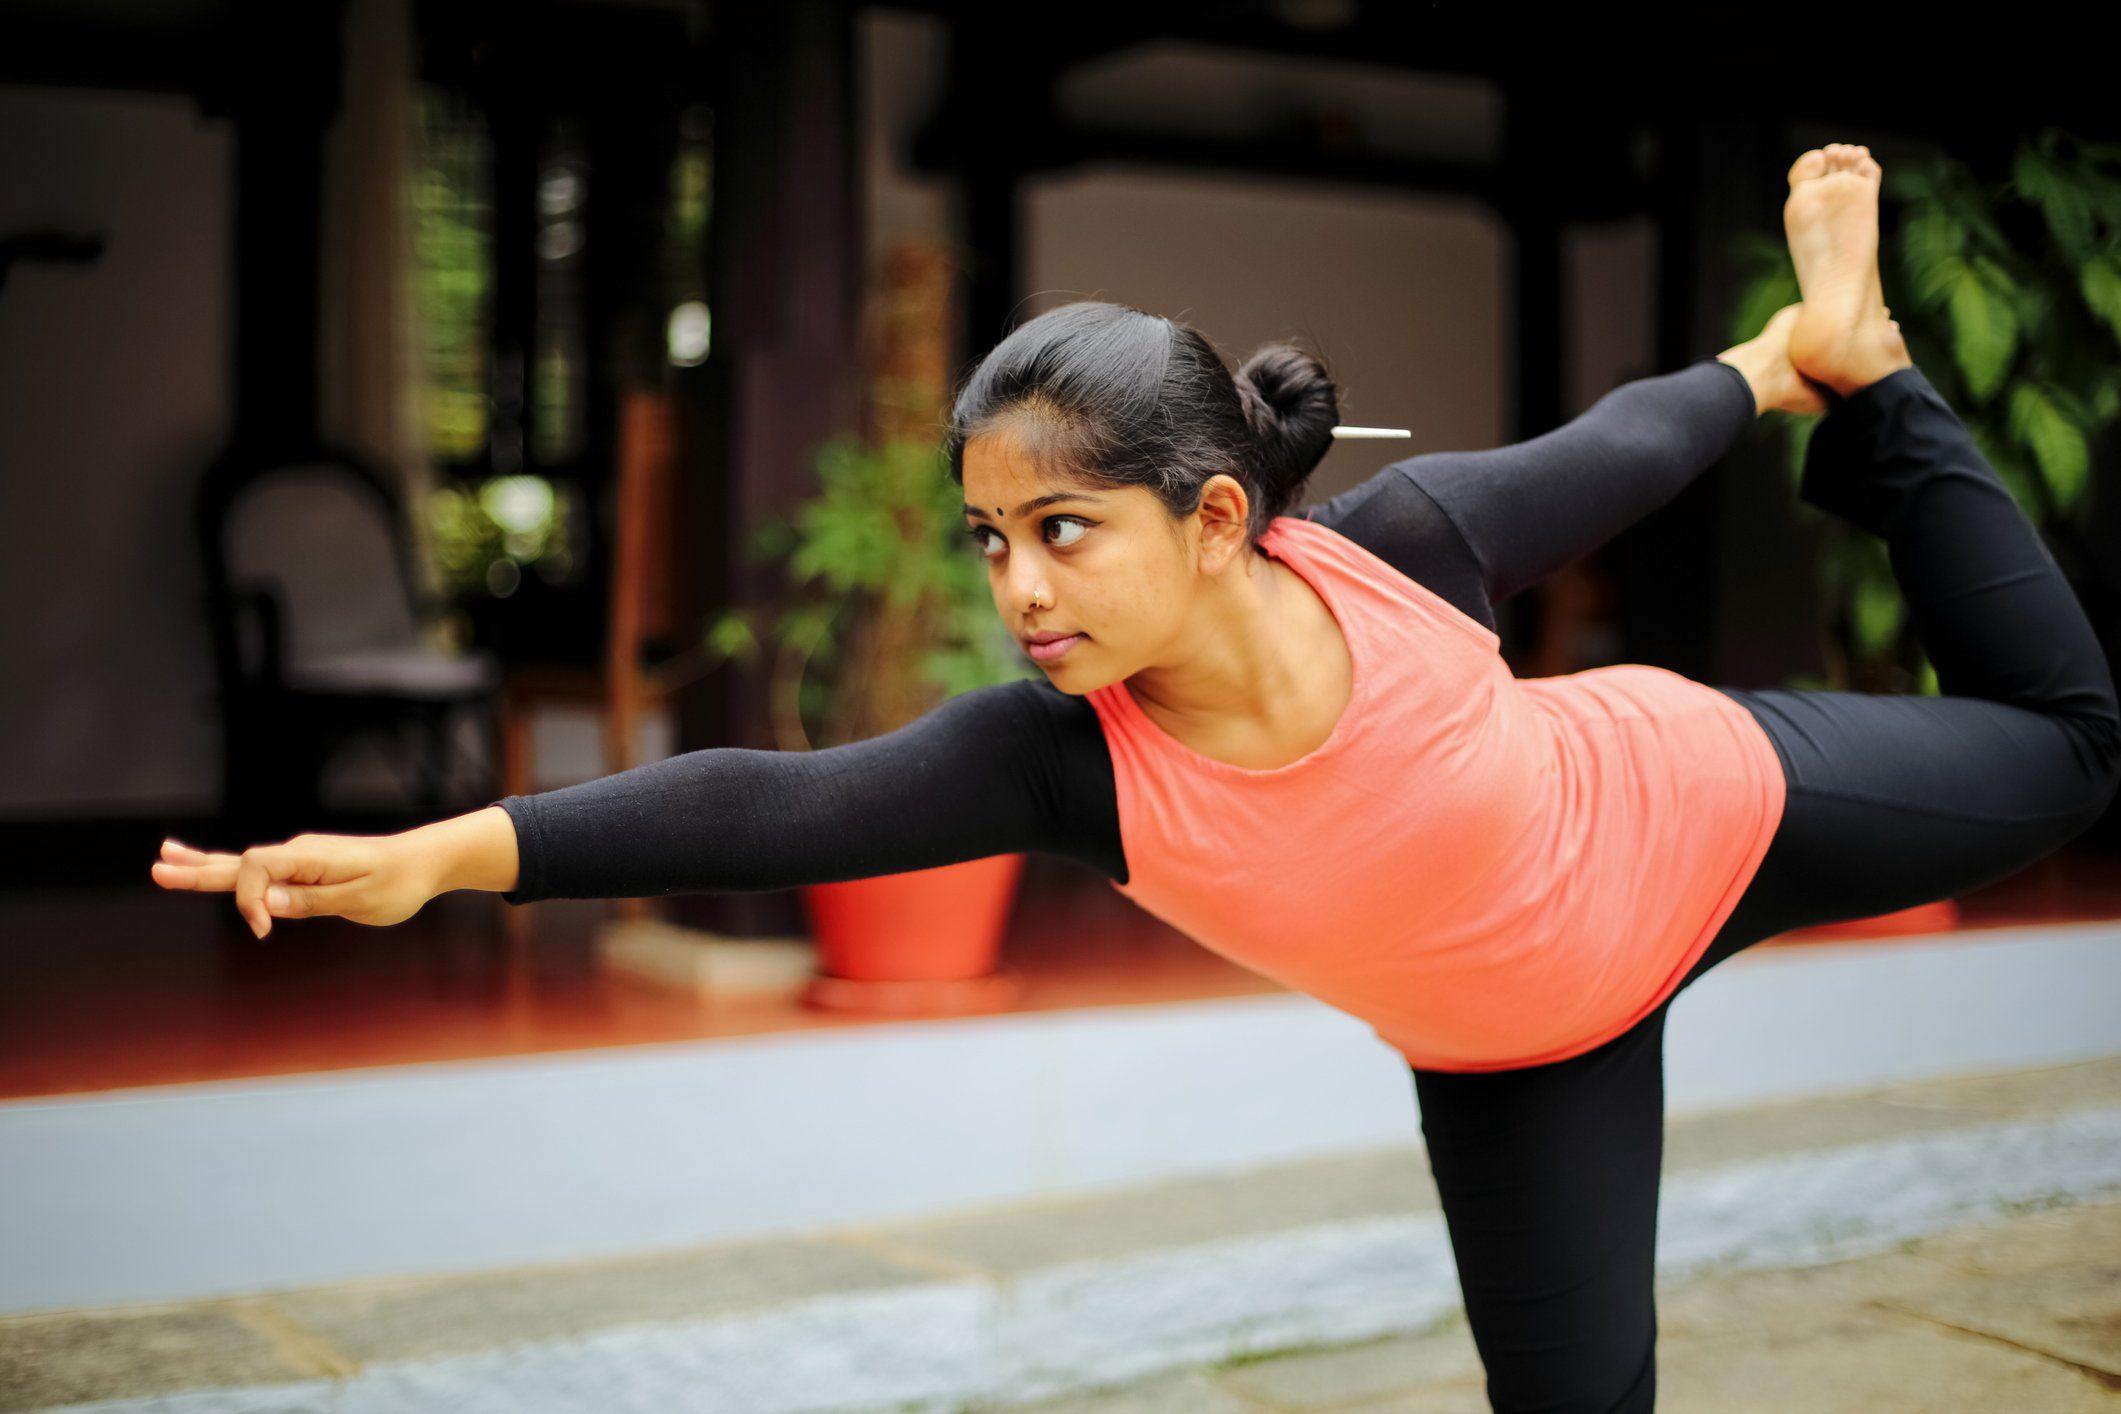 indian woman doing yoga outside